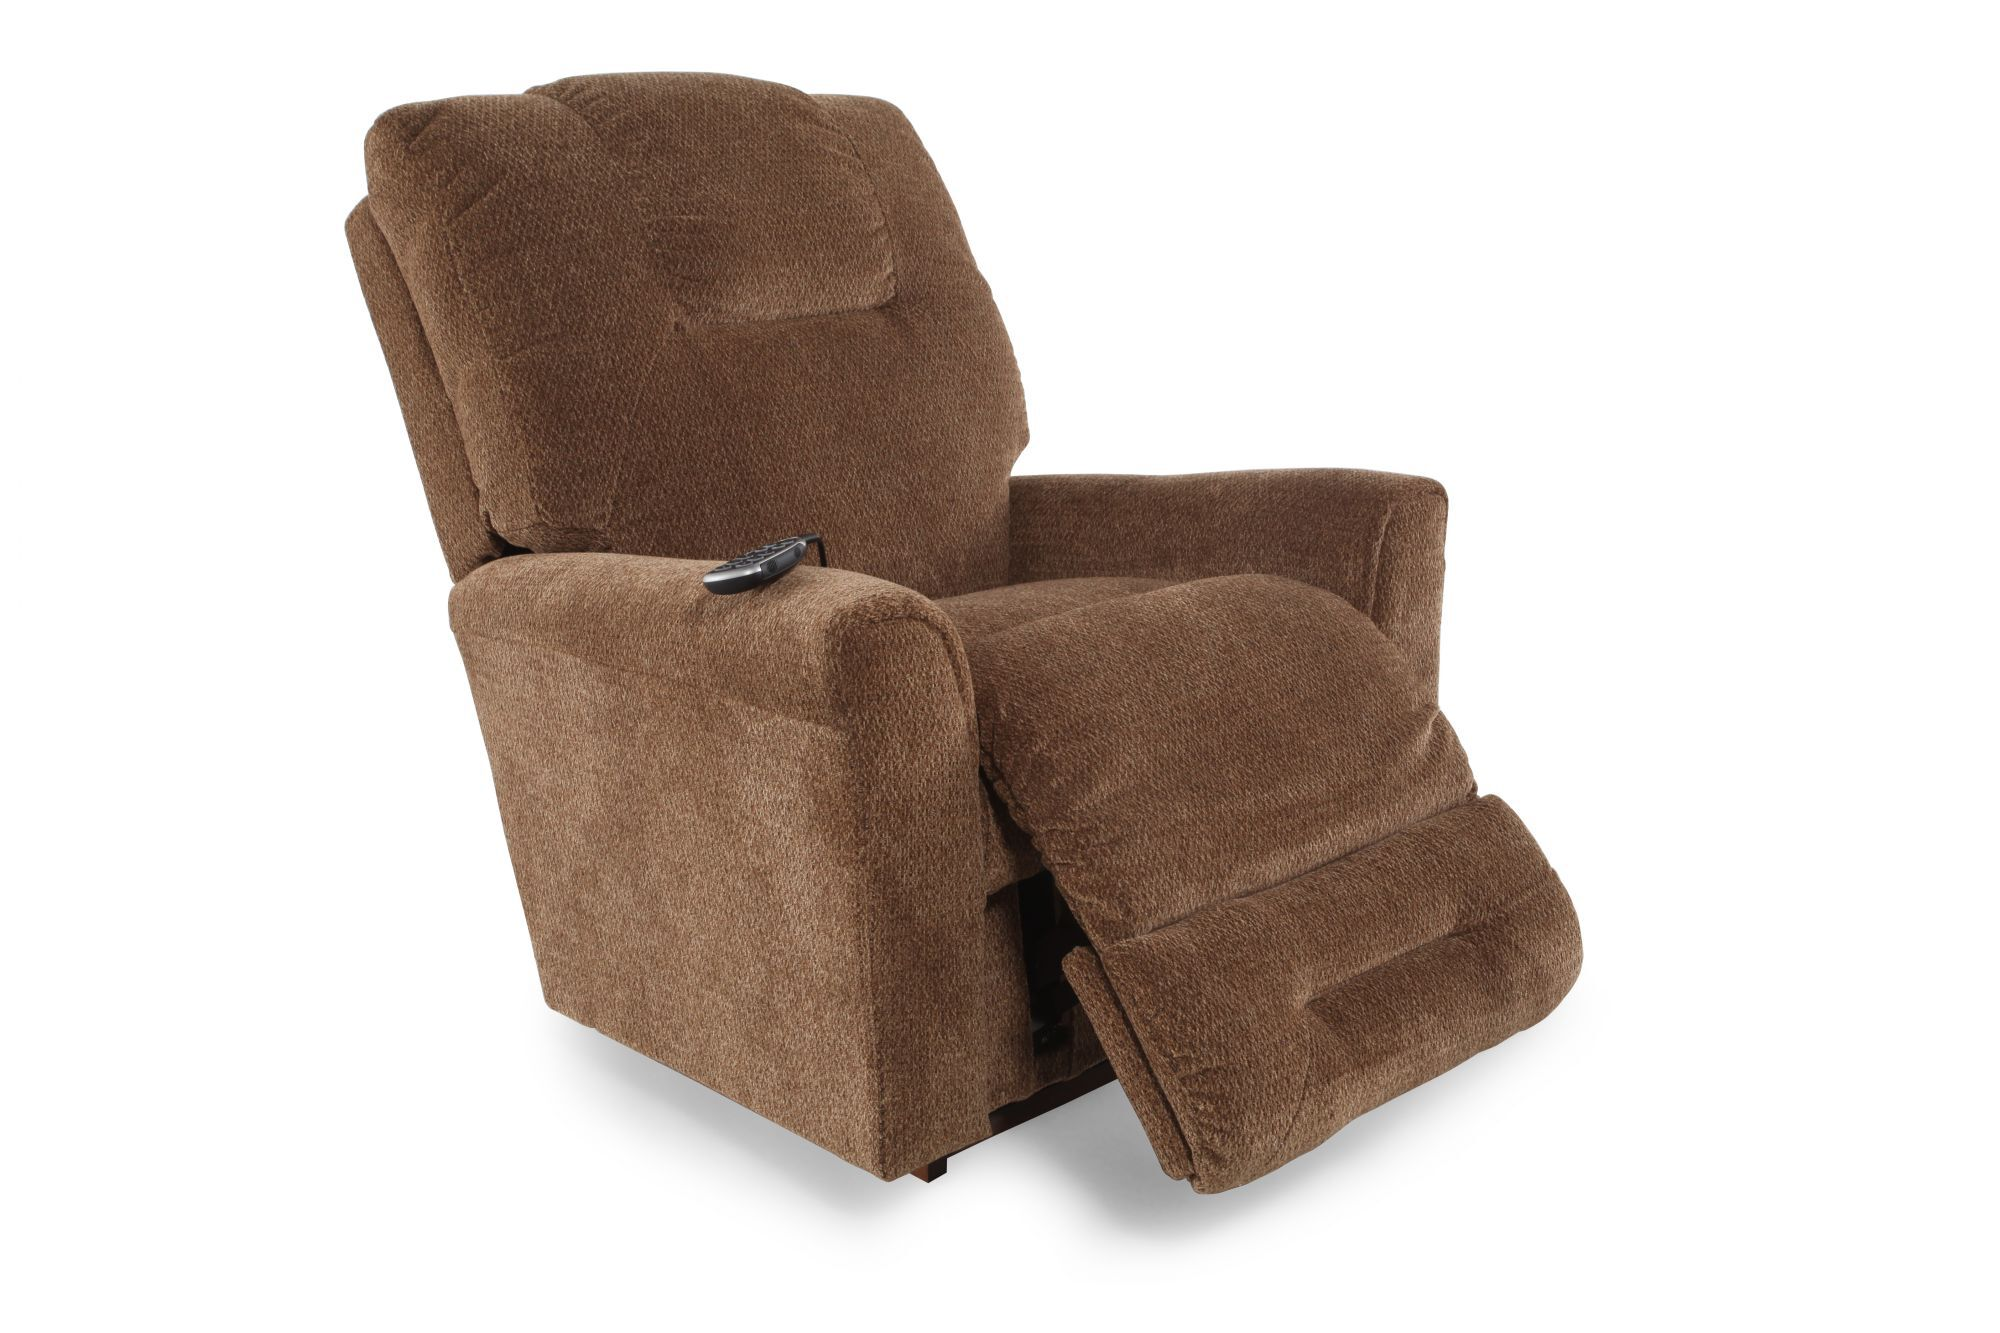 michael nicholas aspen sofa slipcovers for extra large sofas la-z-boy furniture | mathis brothers